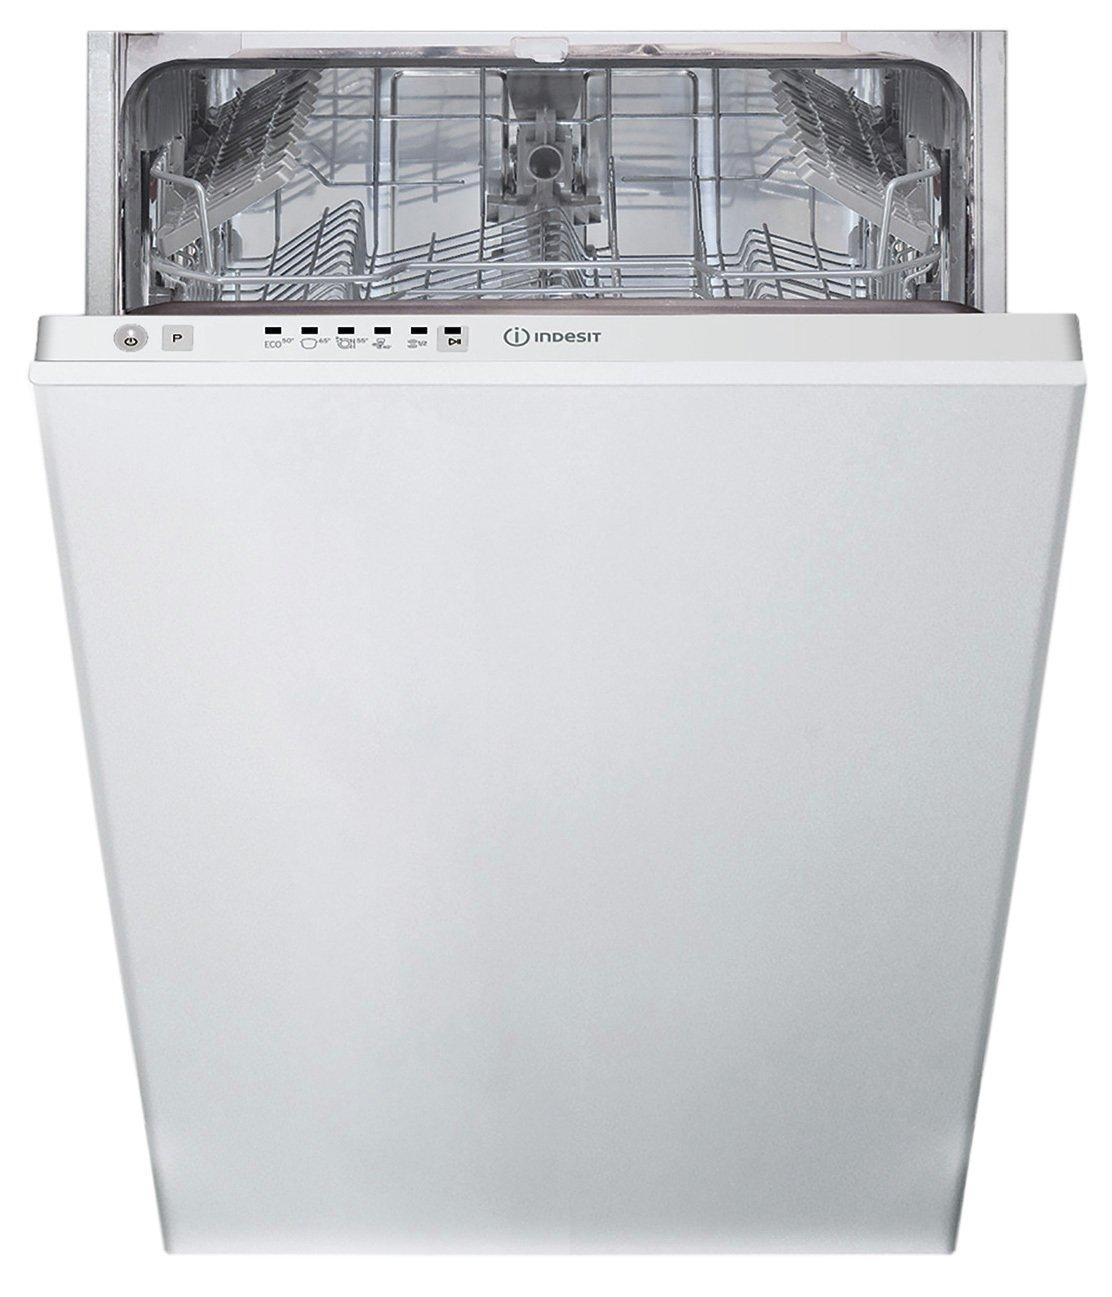 Indesit DSIE2B10UK Integrated Dishwasher - Stainless Steel